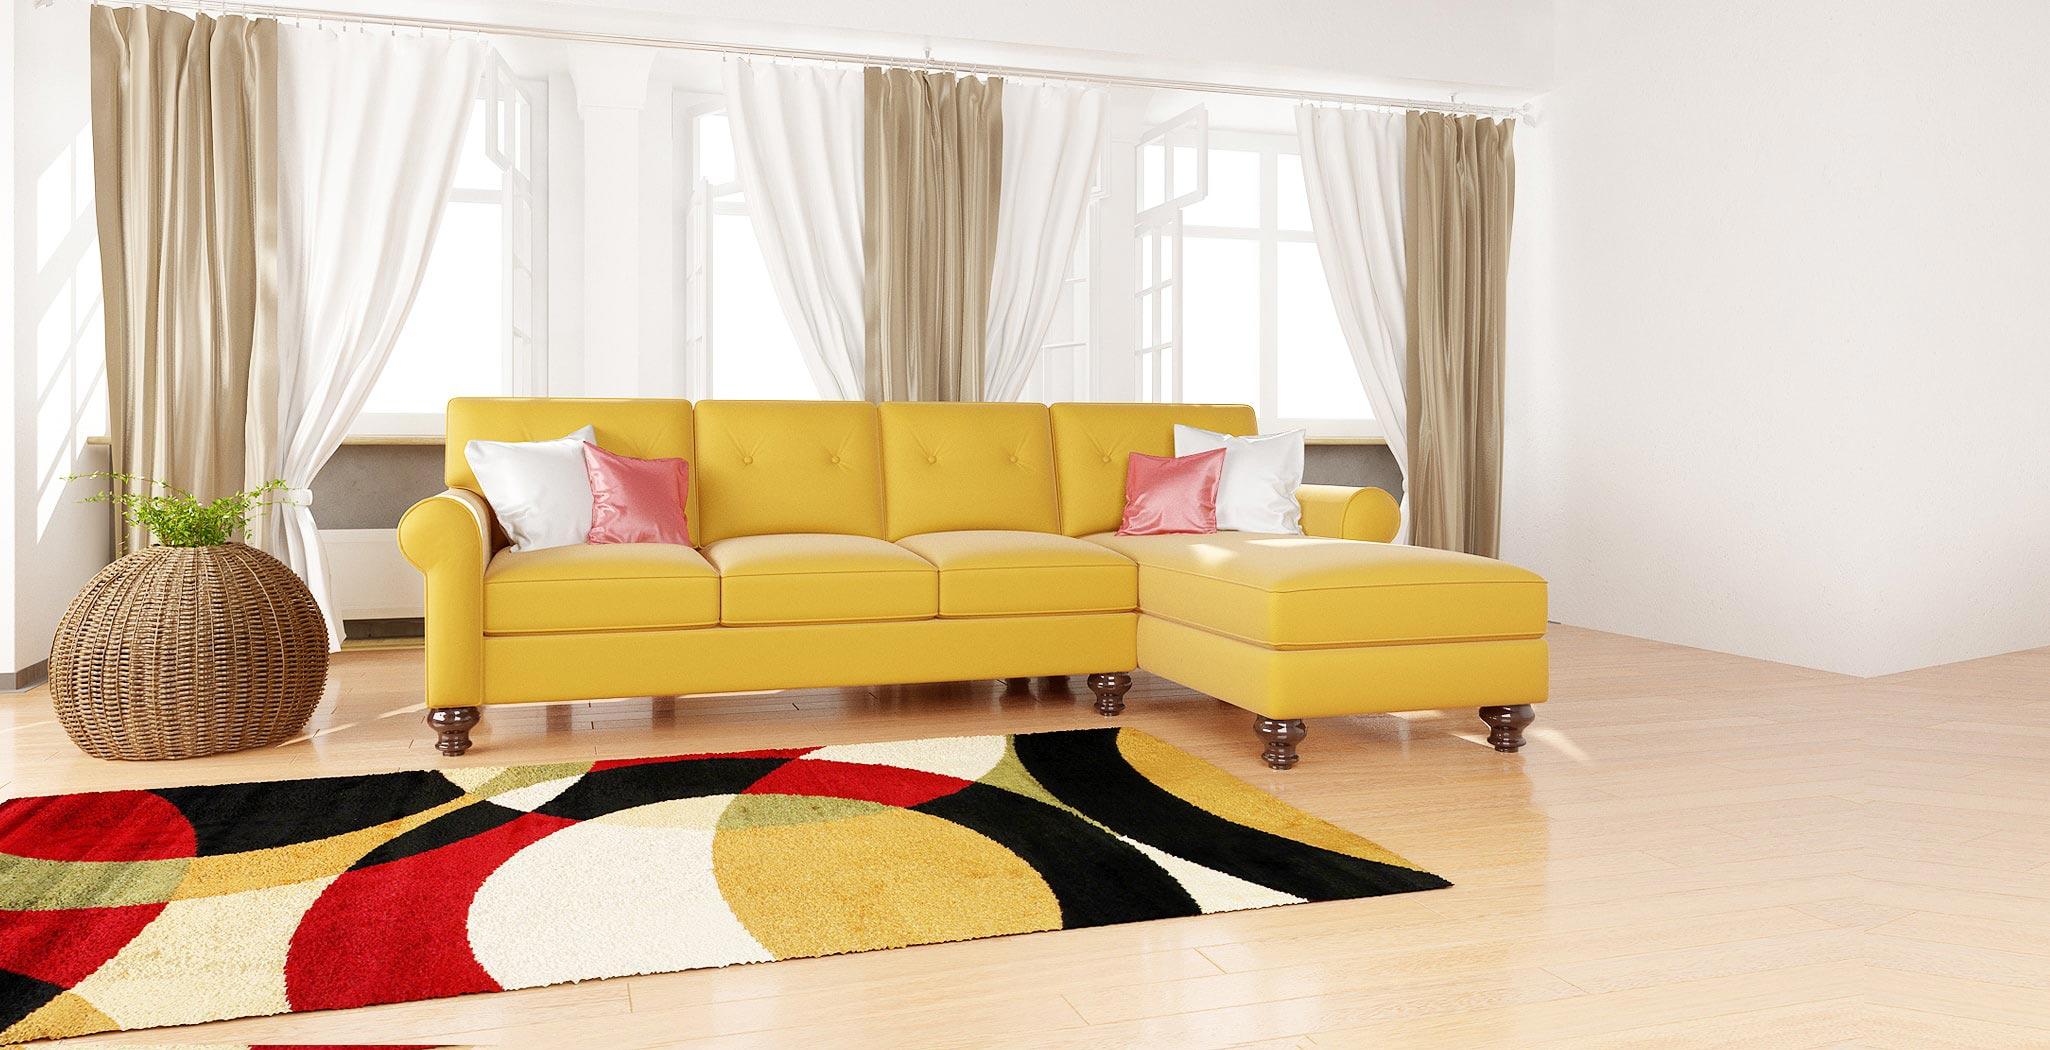 farah panel furniture gallery 5